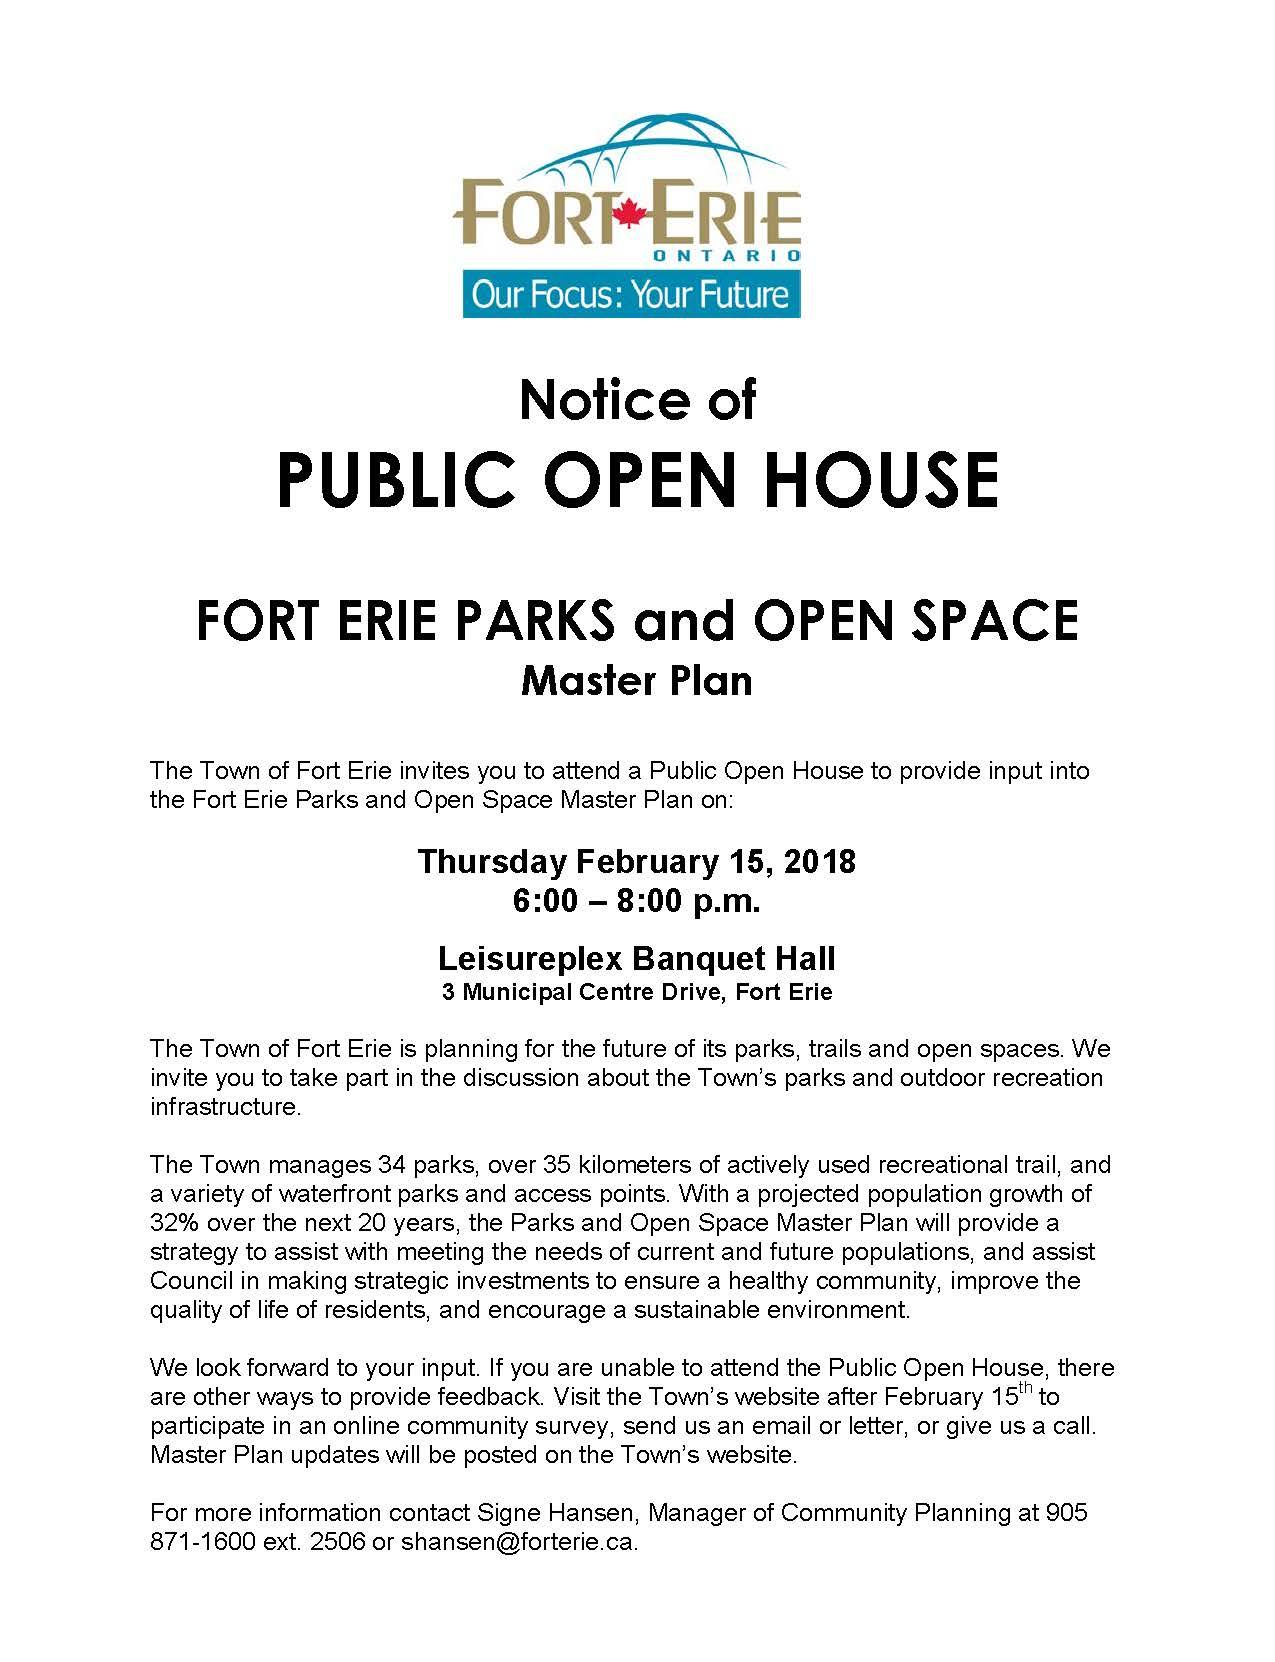 Notice_of_Open_House_Feb_15_18.jpg